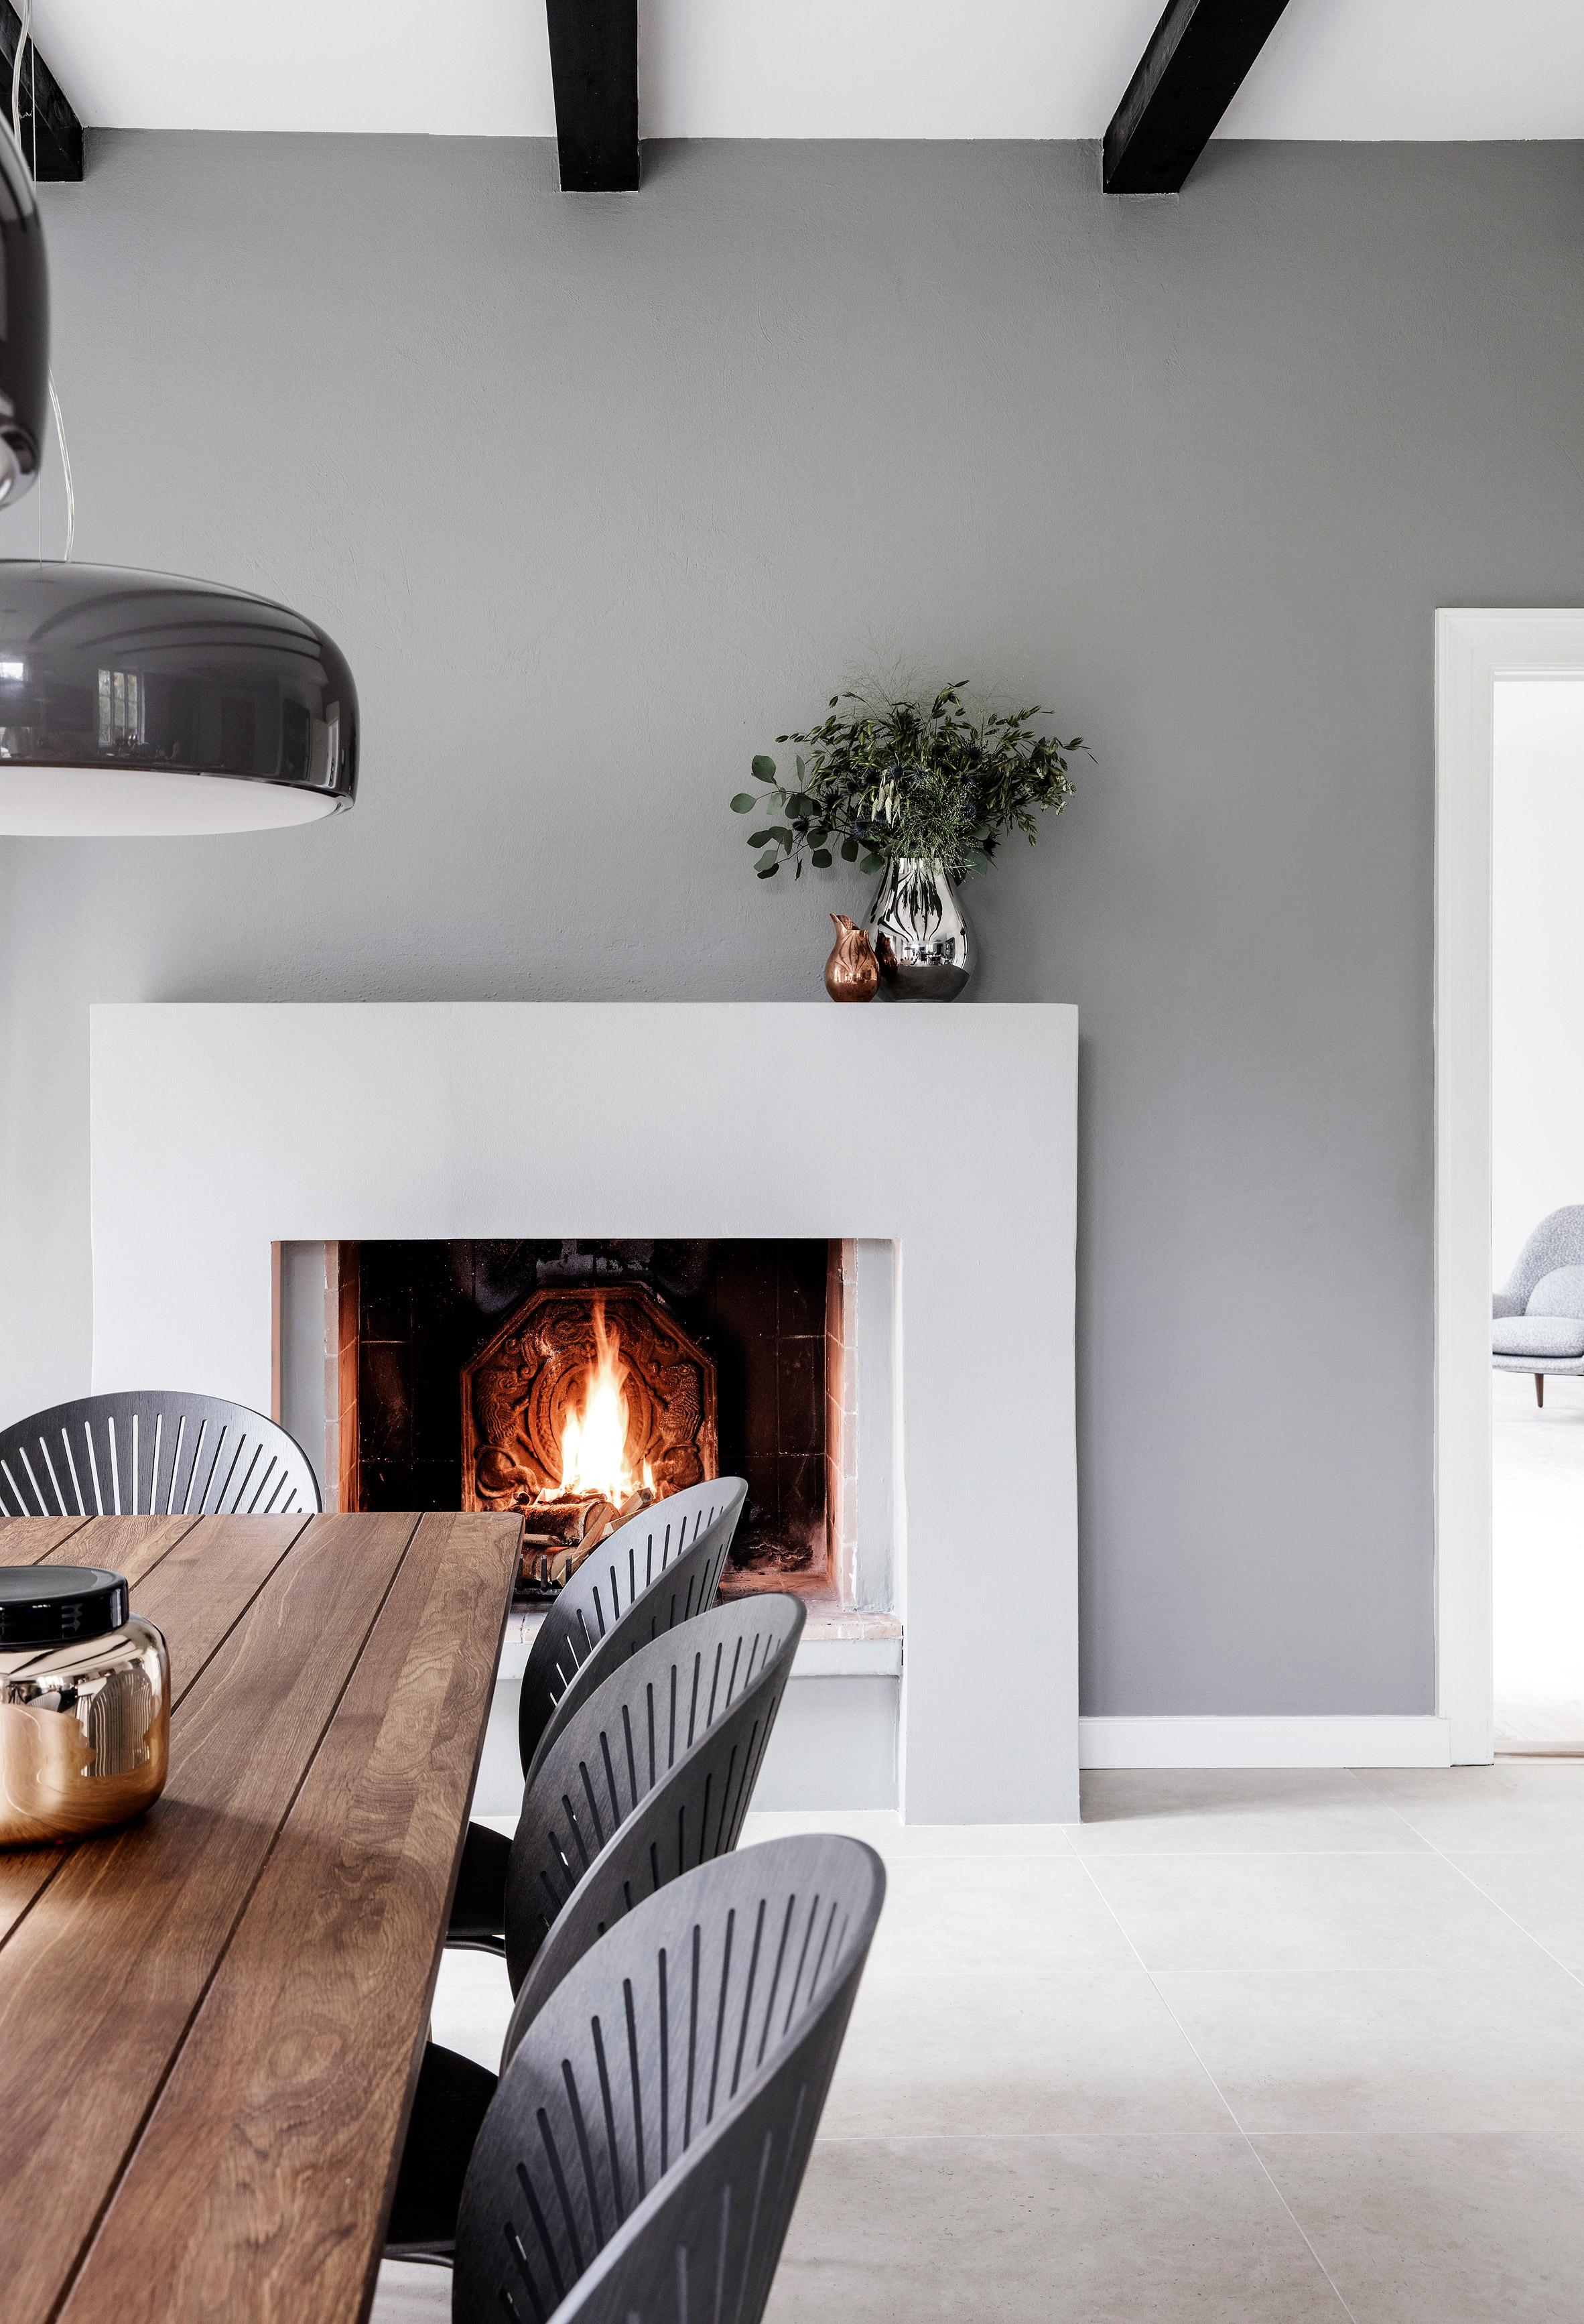 elledecoration vn nhà màu trung tính kaja-moller-home-fredericia-interiors-residential-copenhagen